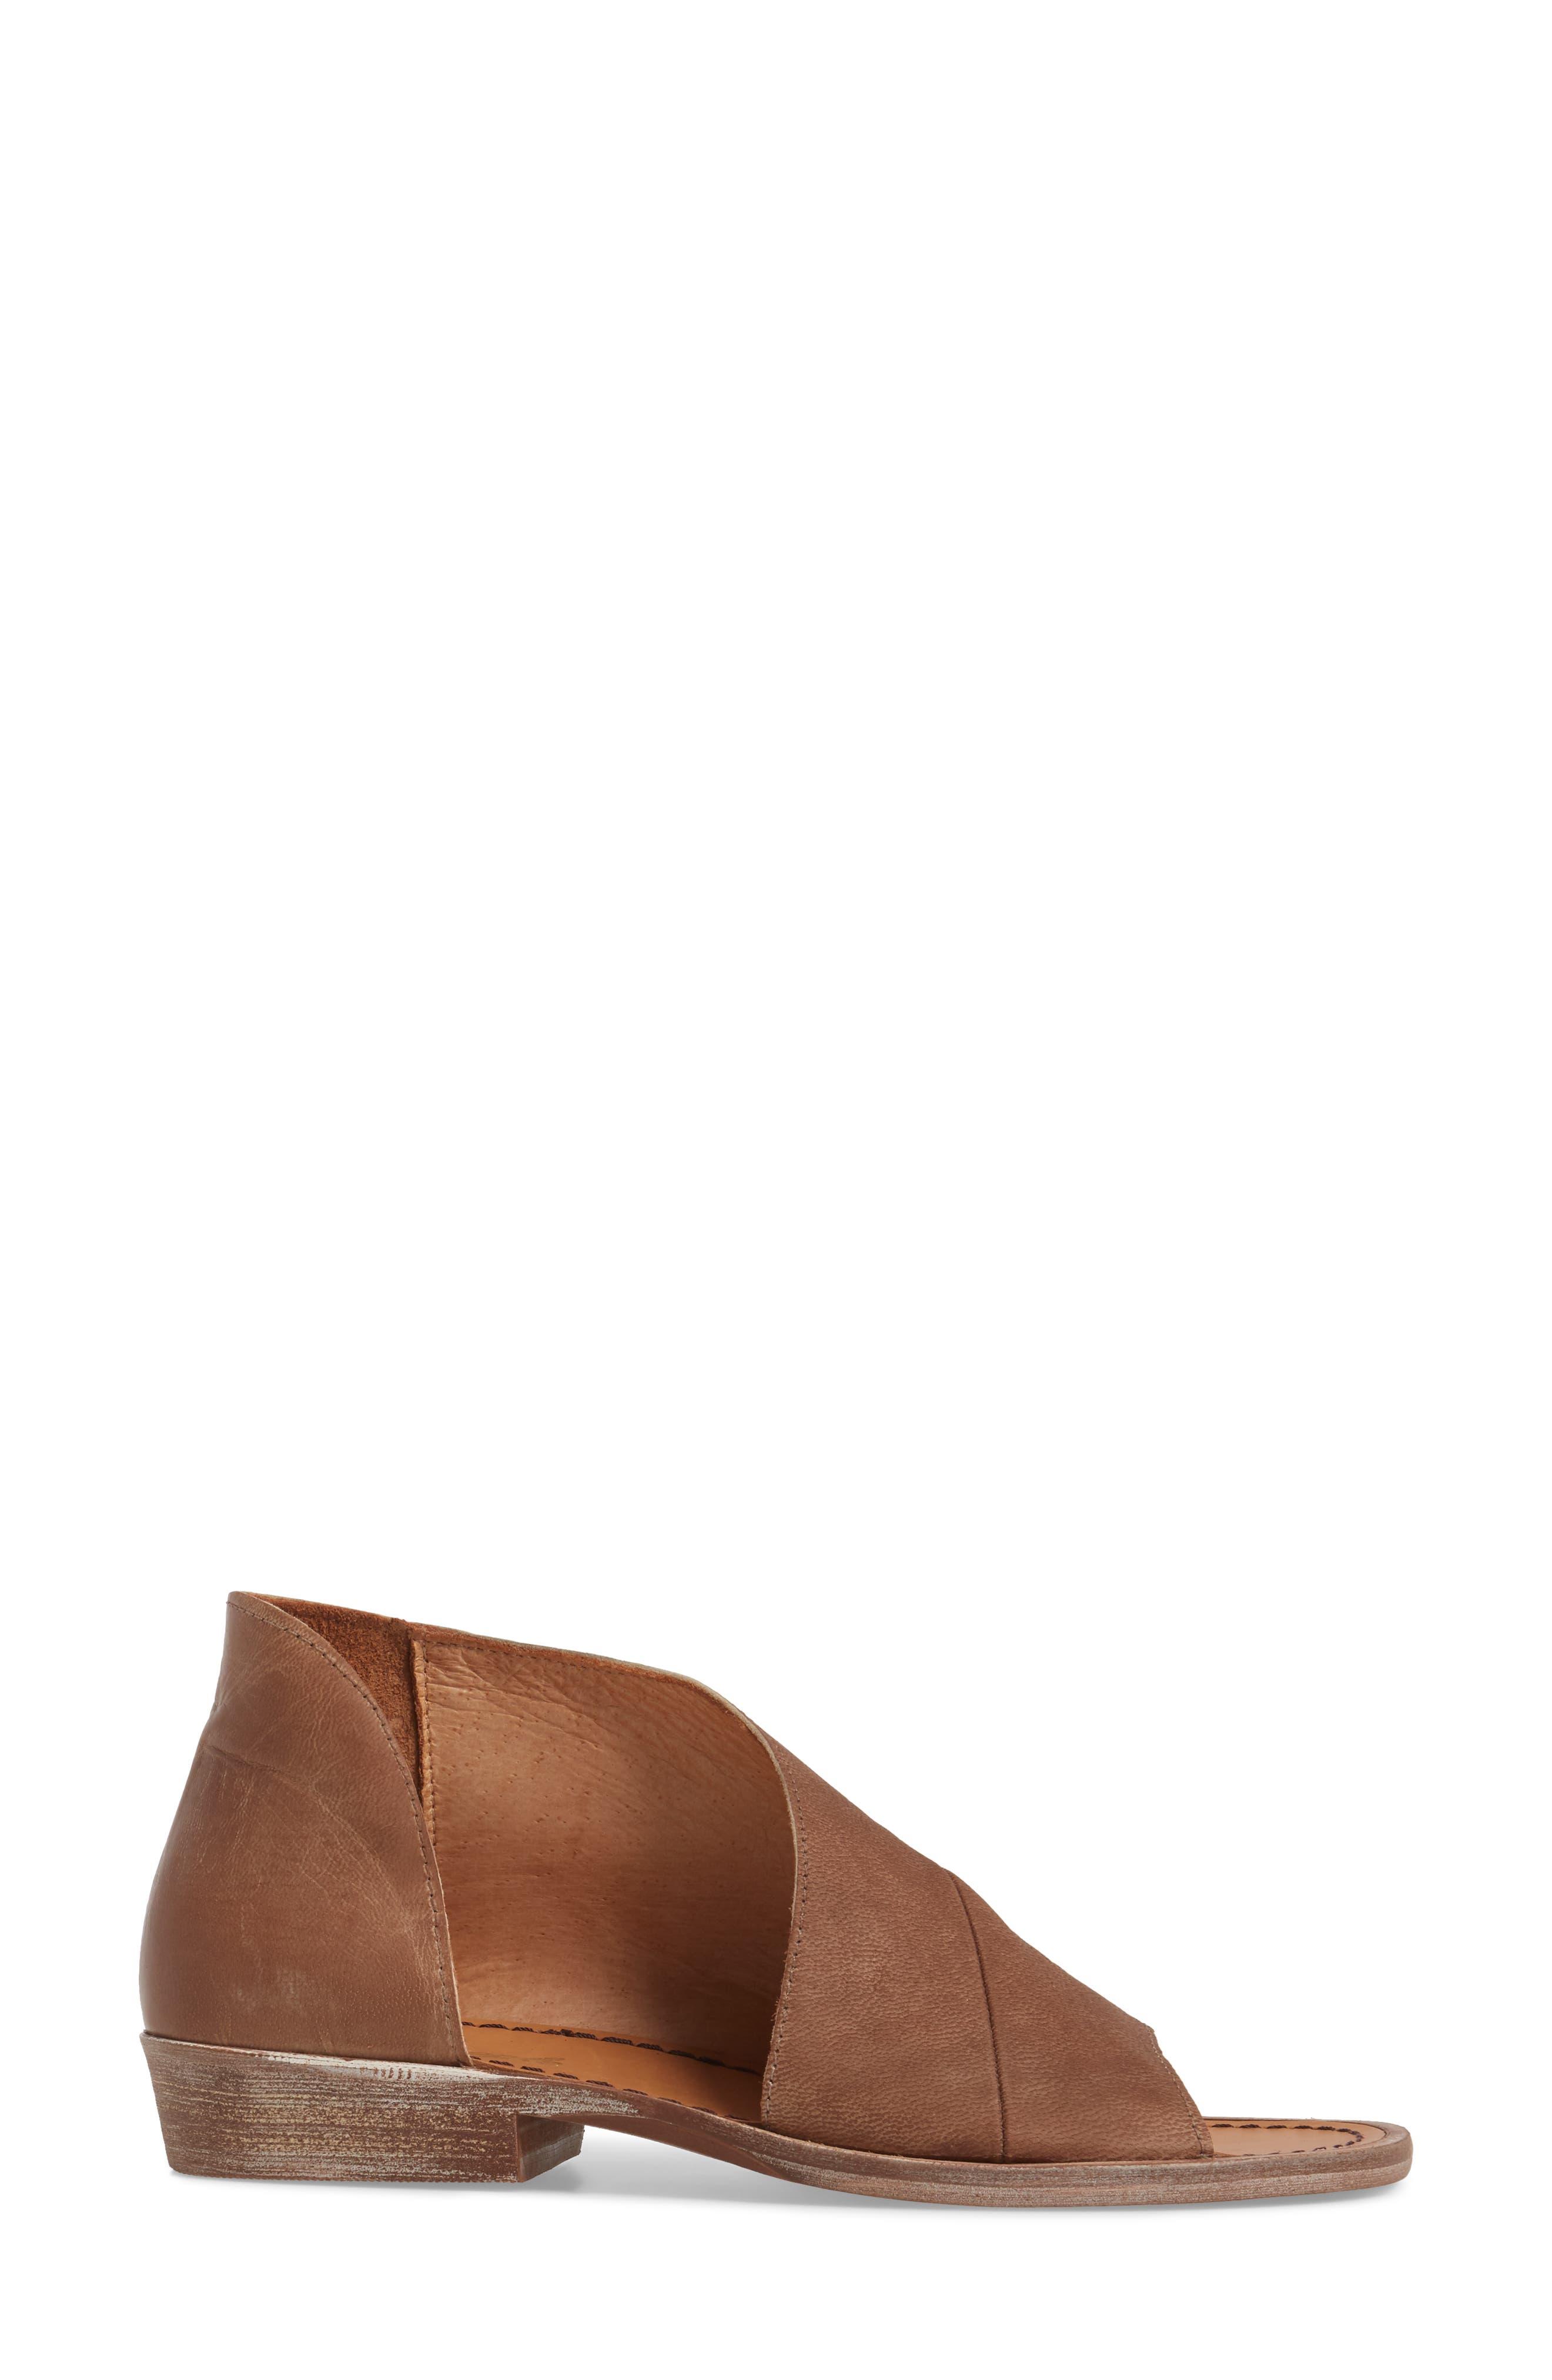 'Mont Blanc' Asymmetrical Sandal,                             Alternate thumbnail 39, color,